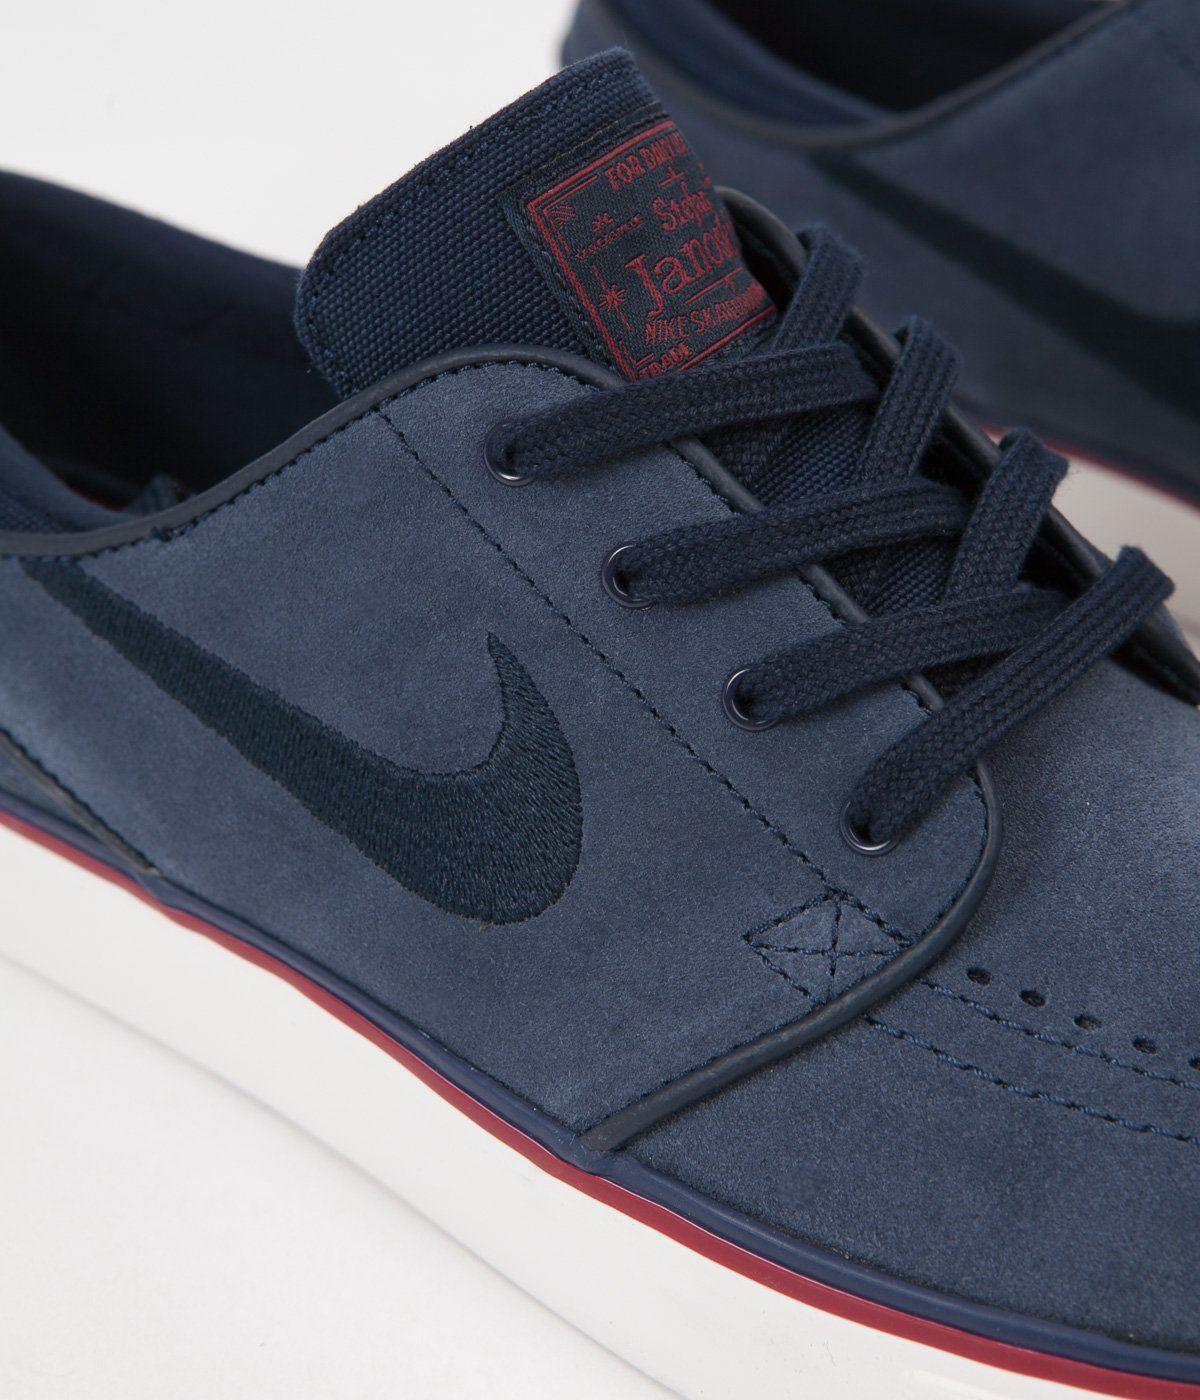 Nike SB Womens Stefan Janoski Shoes - Obsidian   Dark Obsidian - Team Red 713ec1a9cf